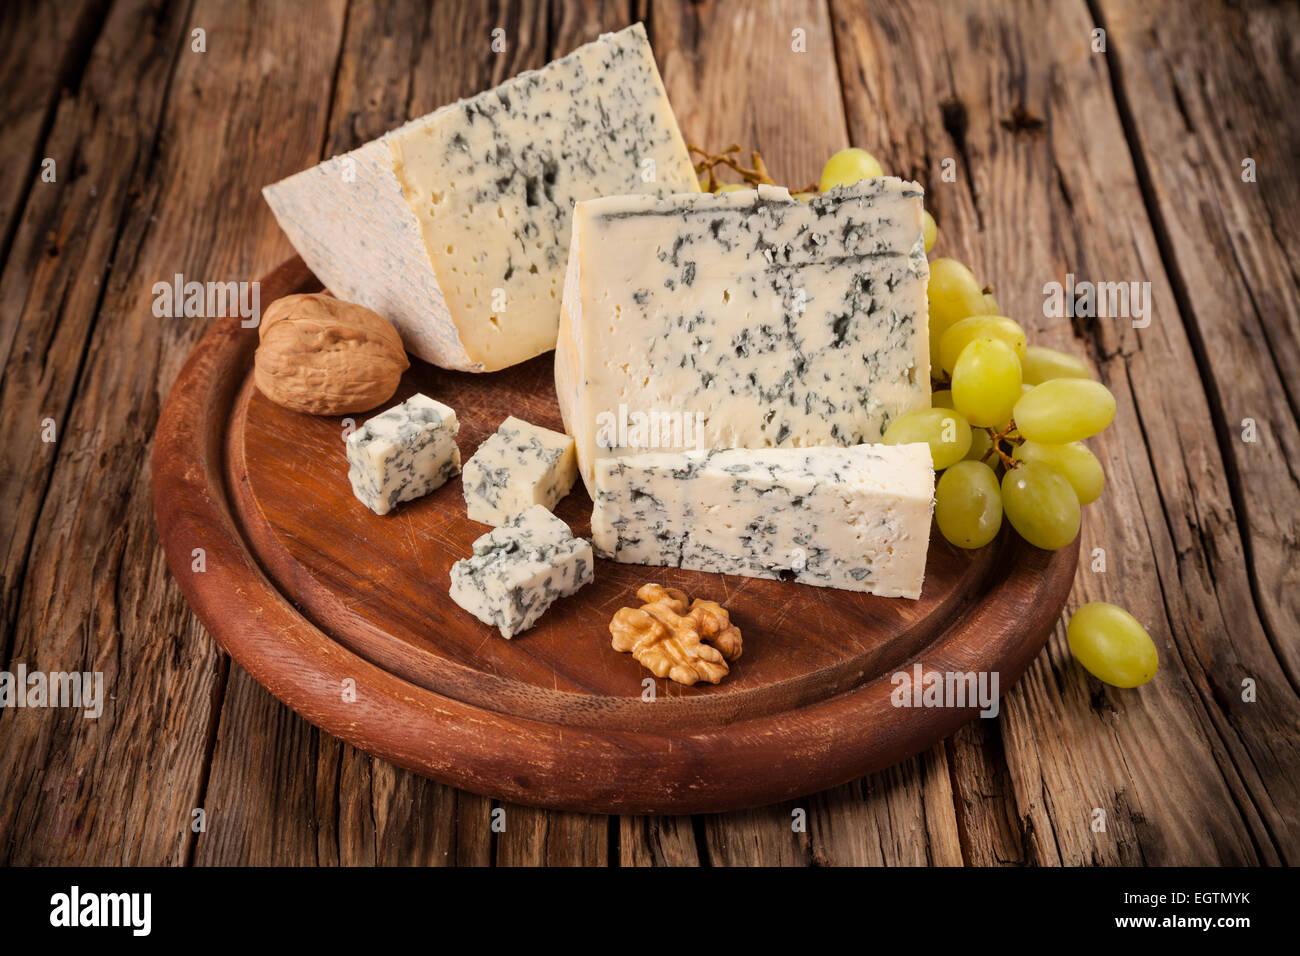 Still life de queso azul sirve en madera Imagen De Stock